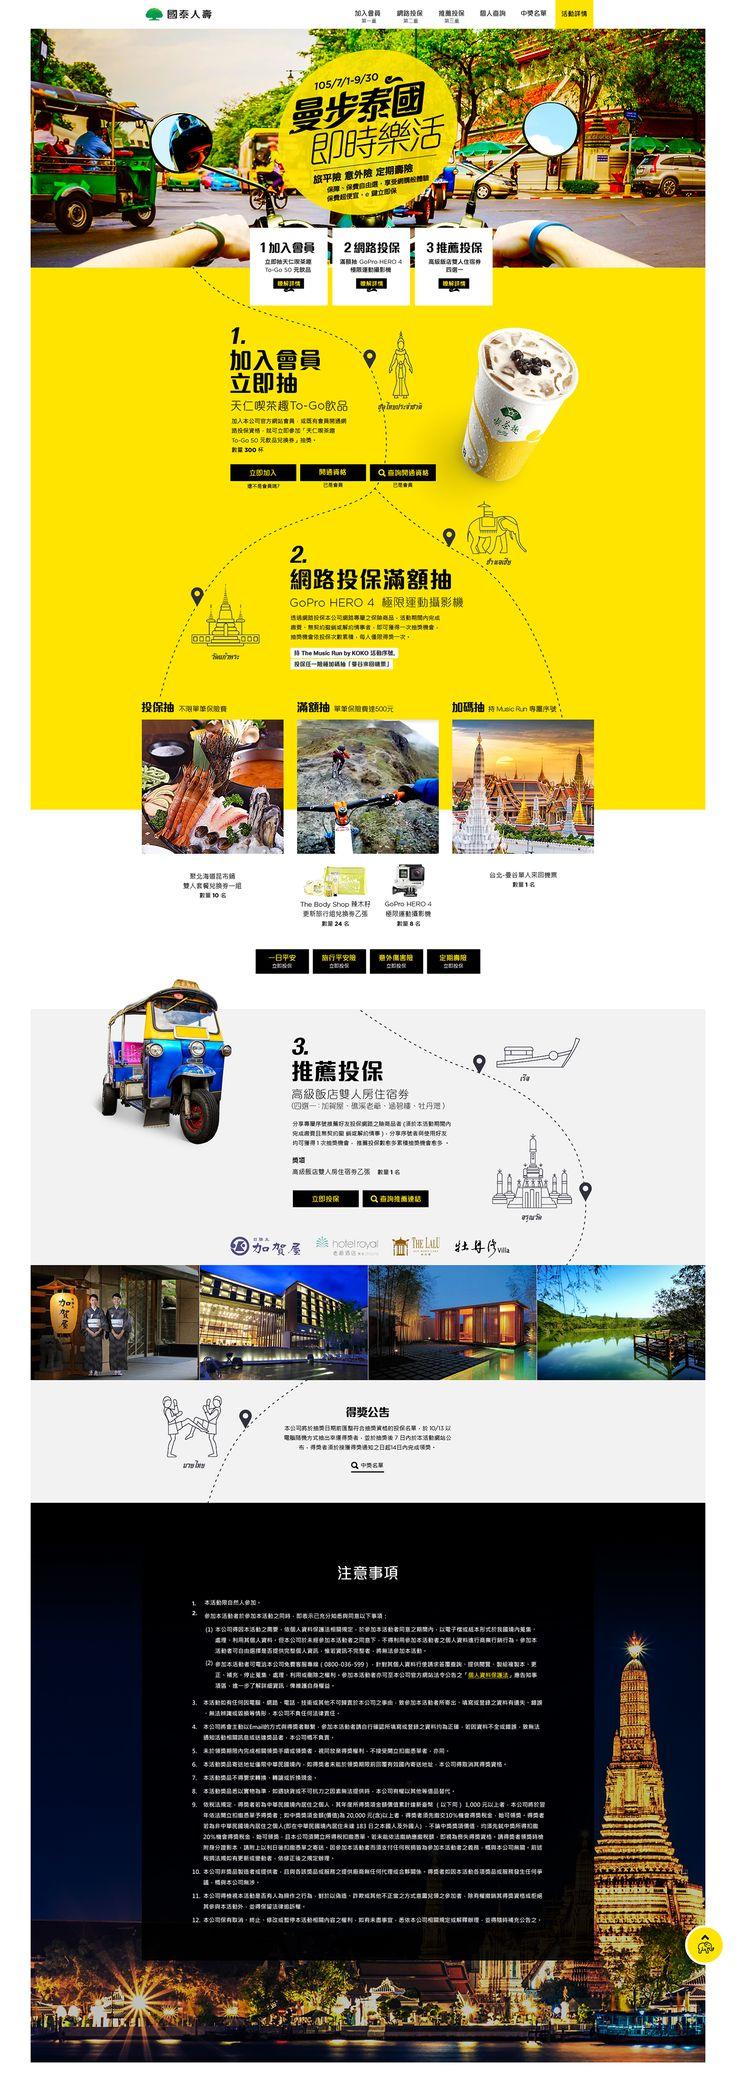 Cathay Life Insurance Event site - Bangkok layout